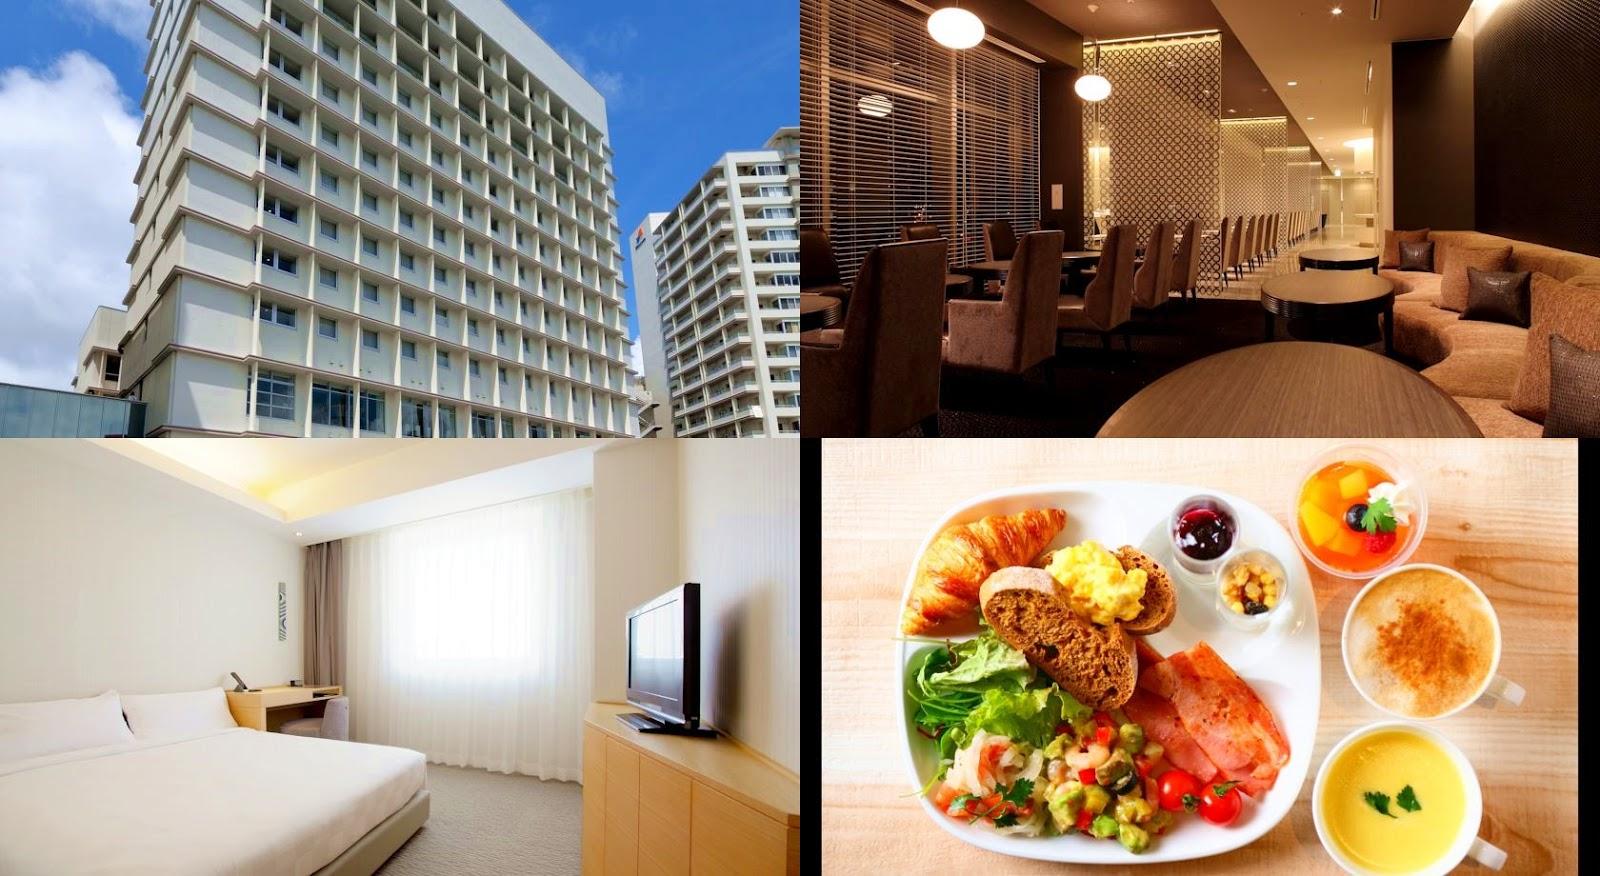 沖繩-住宿-推薦-那霸-東急REI酒店-Naha-Tokyu-REI-Hotel-Okinawa-hotel-recommendation